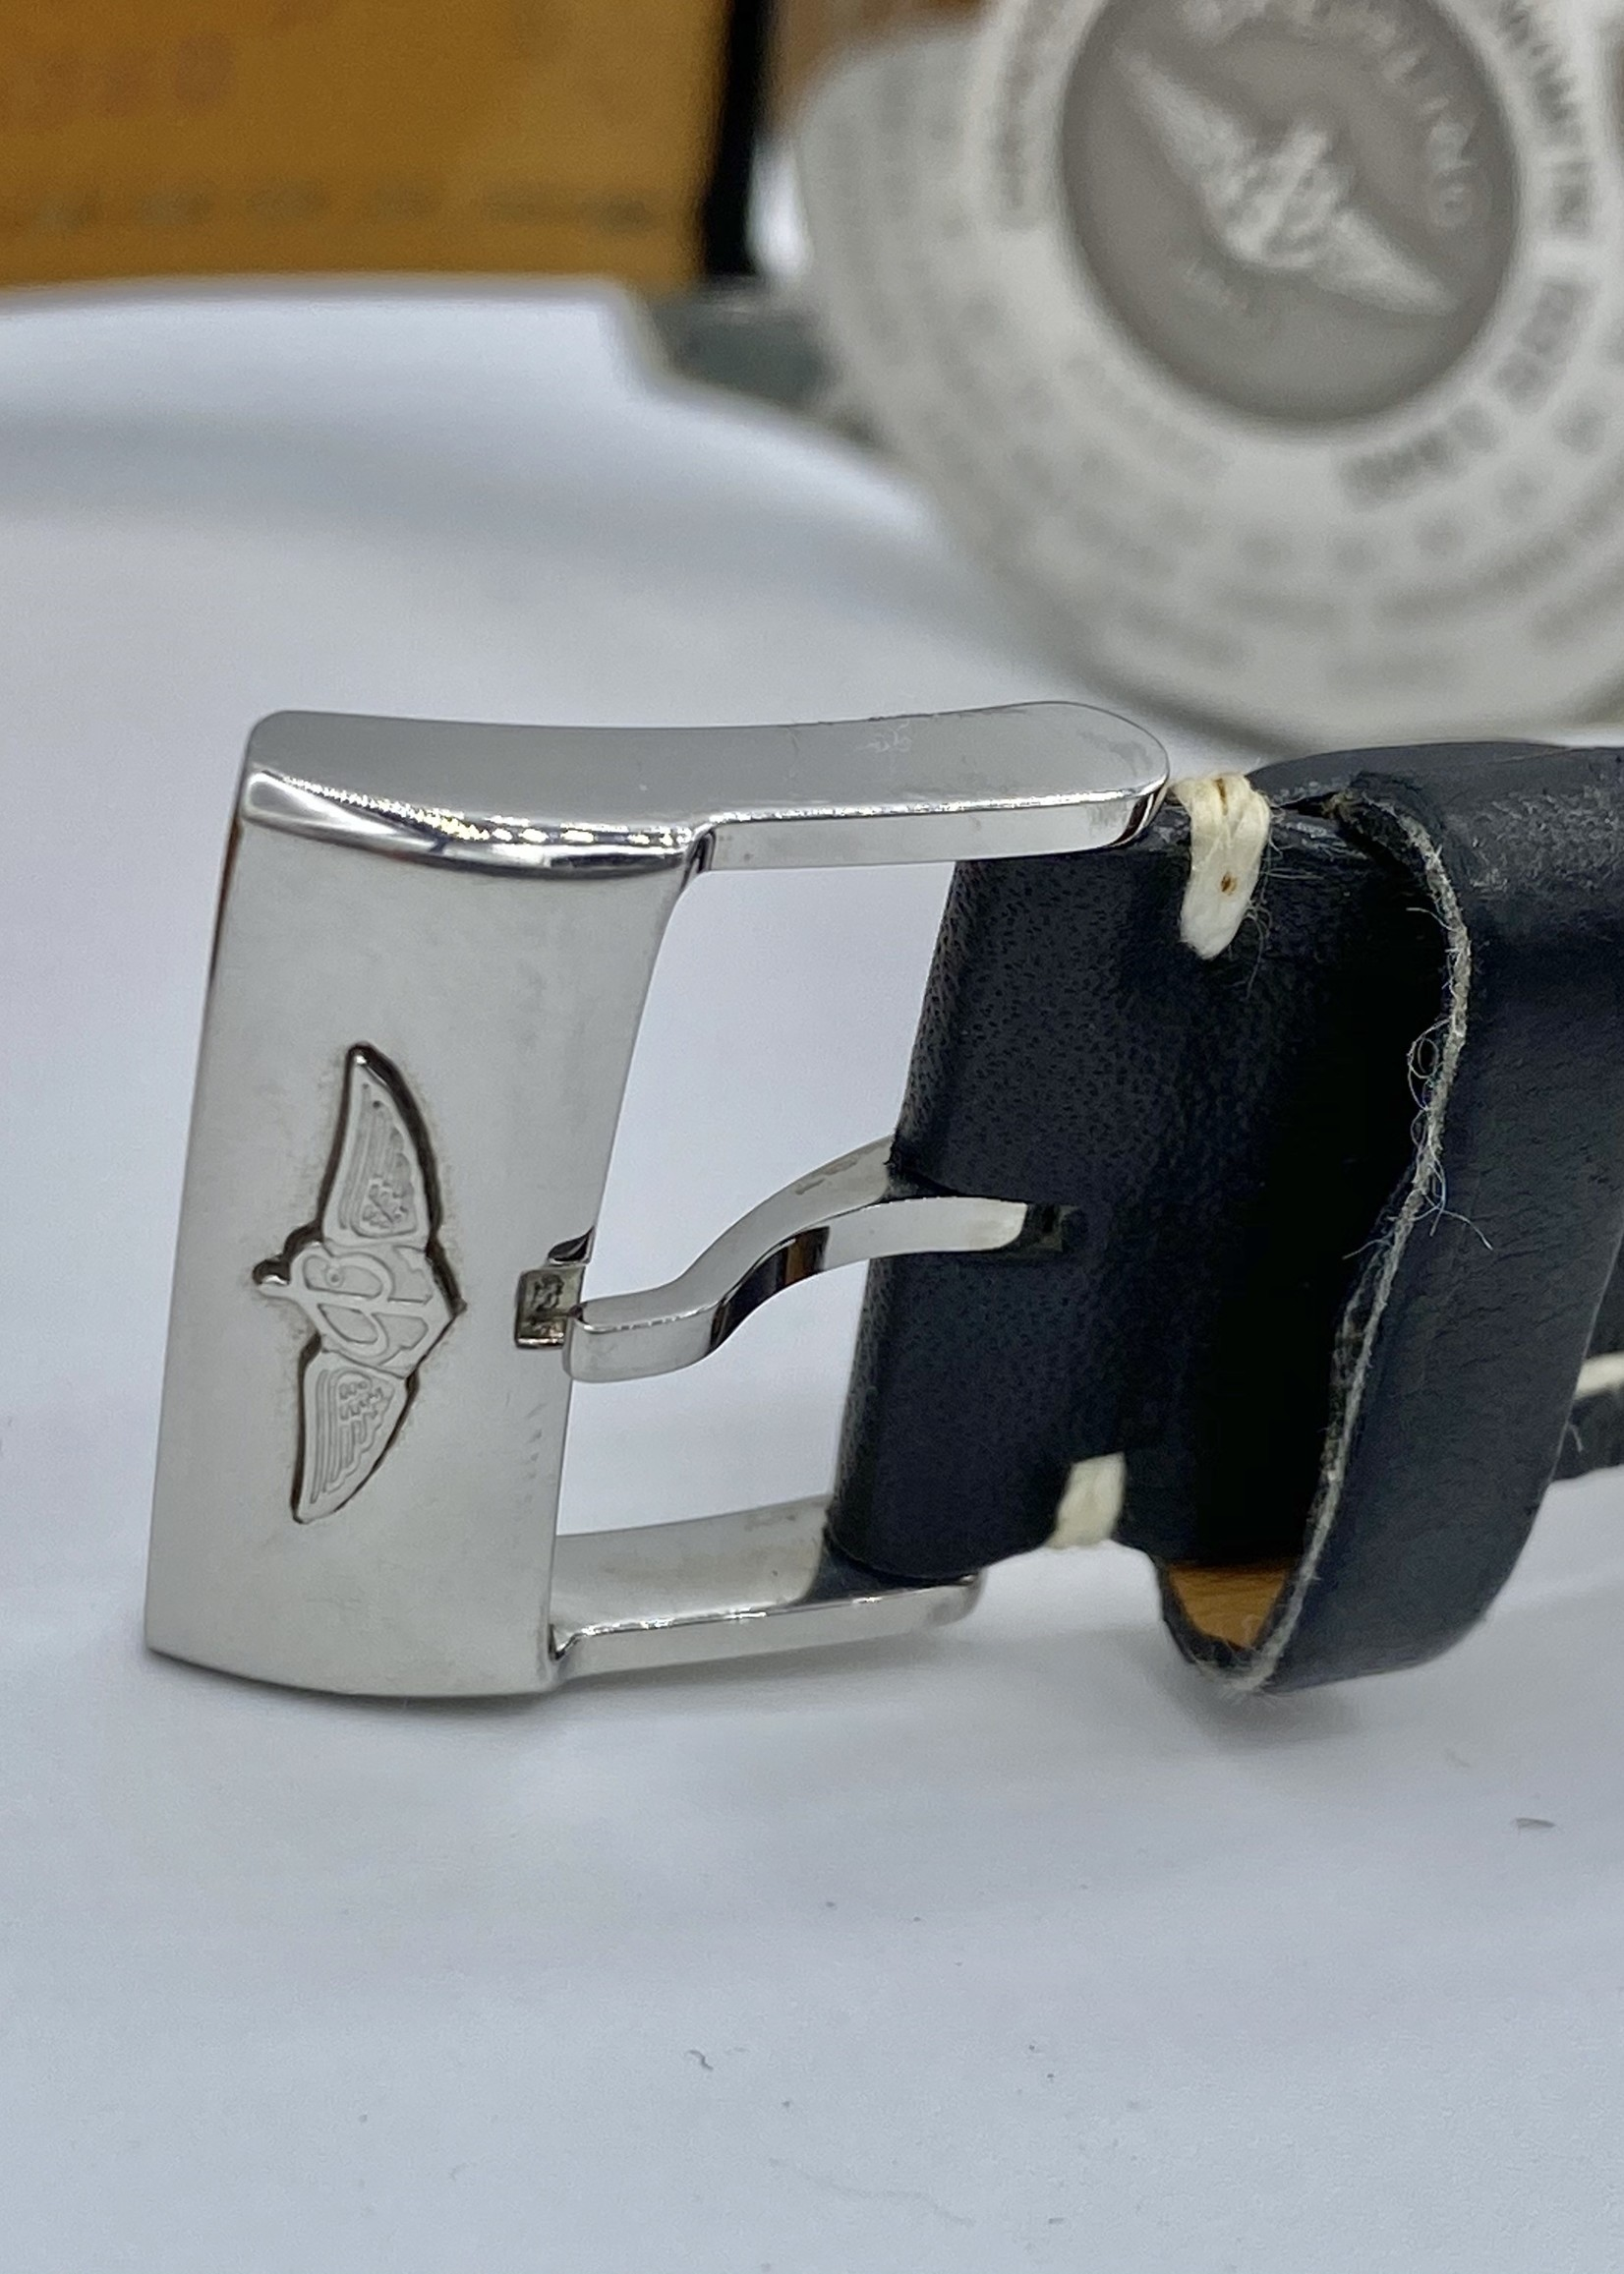 Breitling Navitimer- buckle